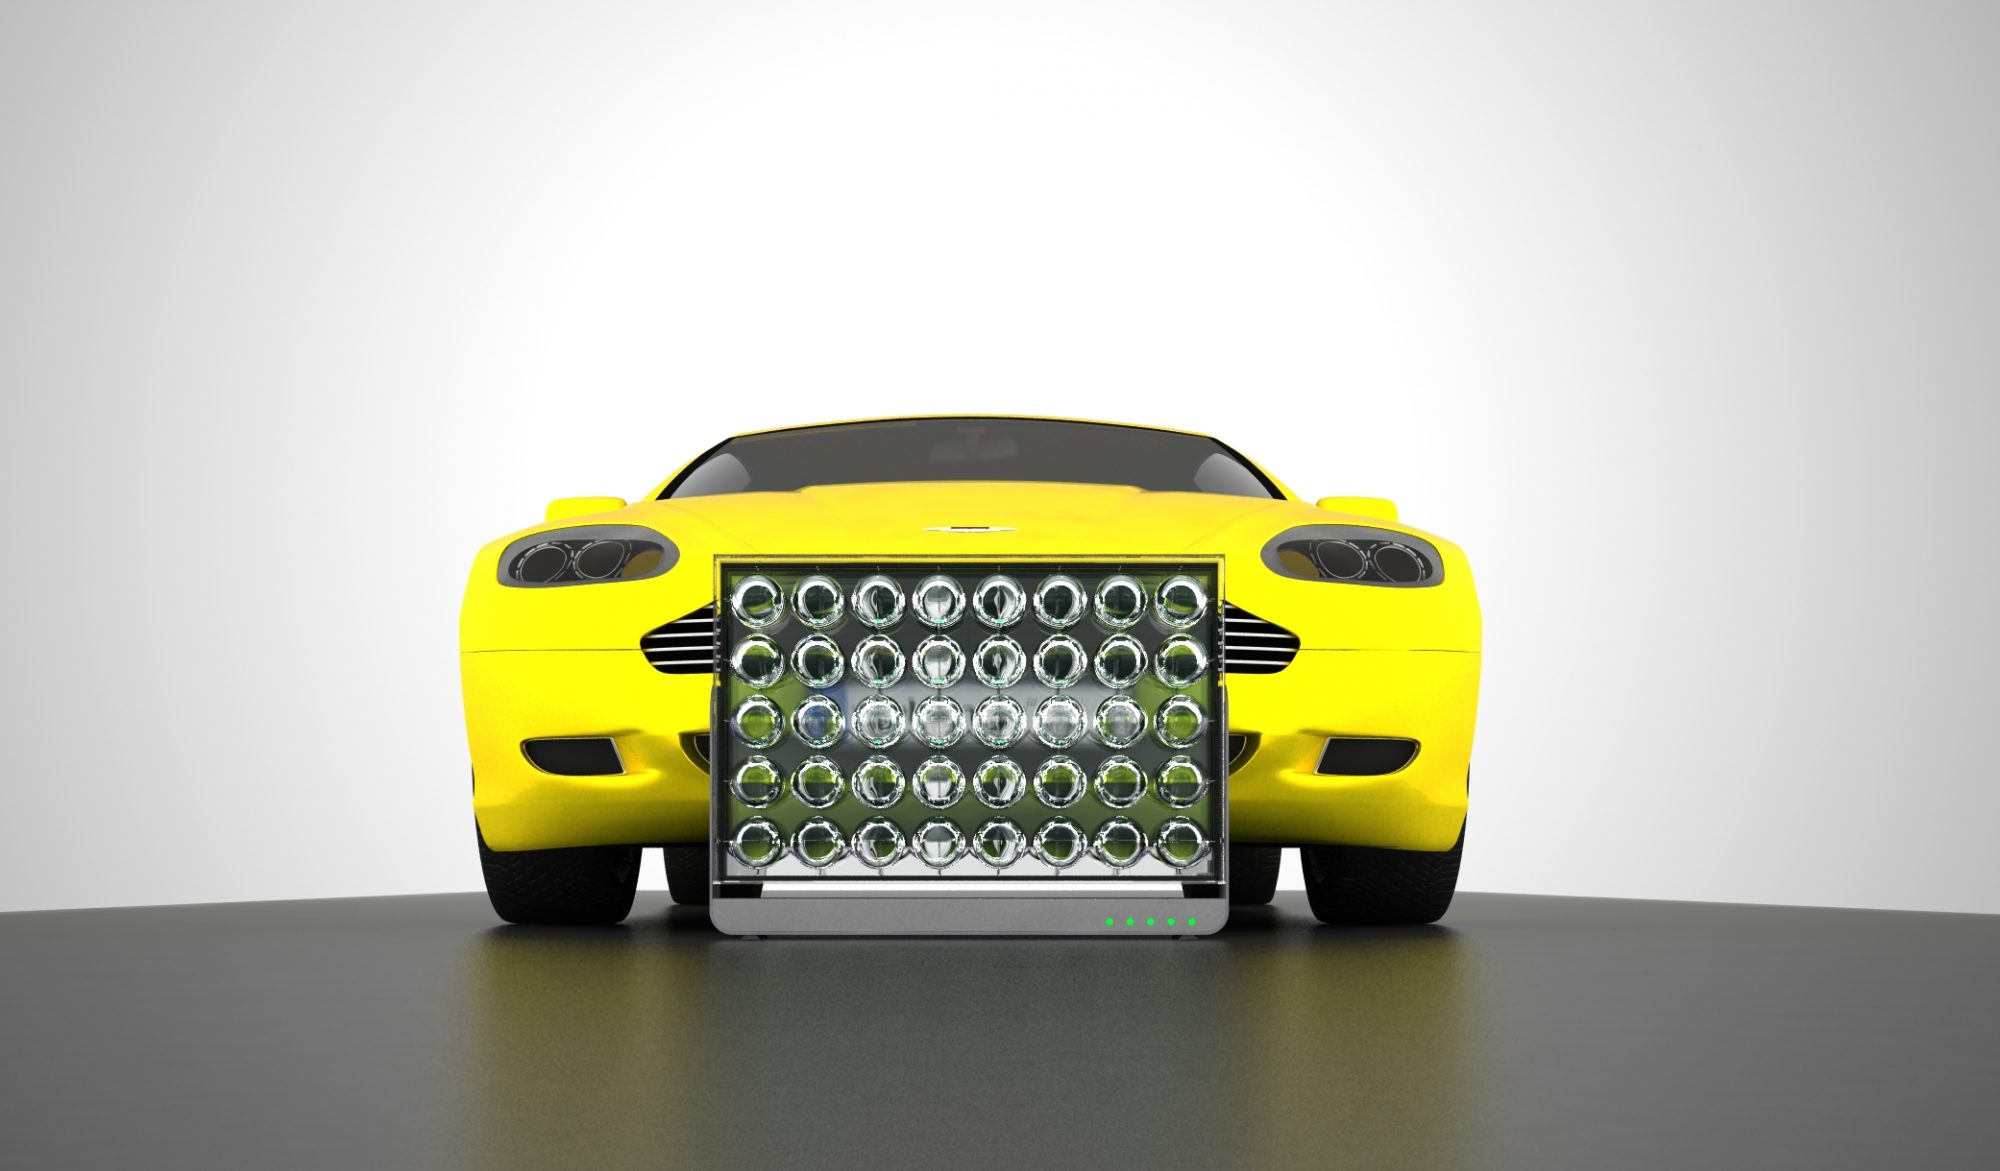 Rawlemon Solar Architecture